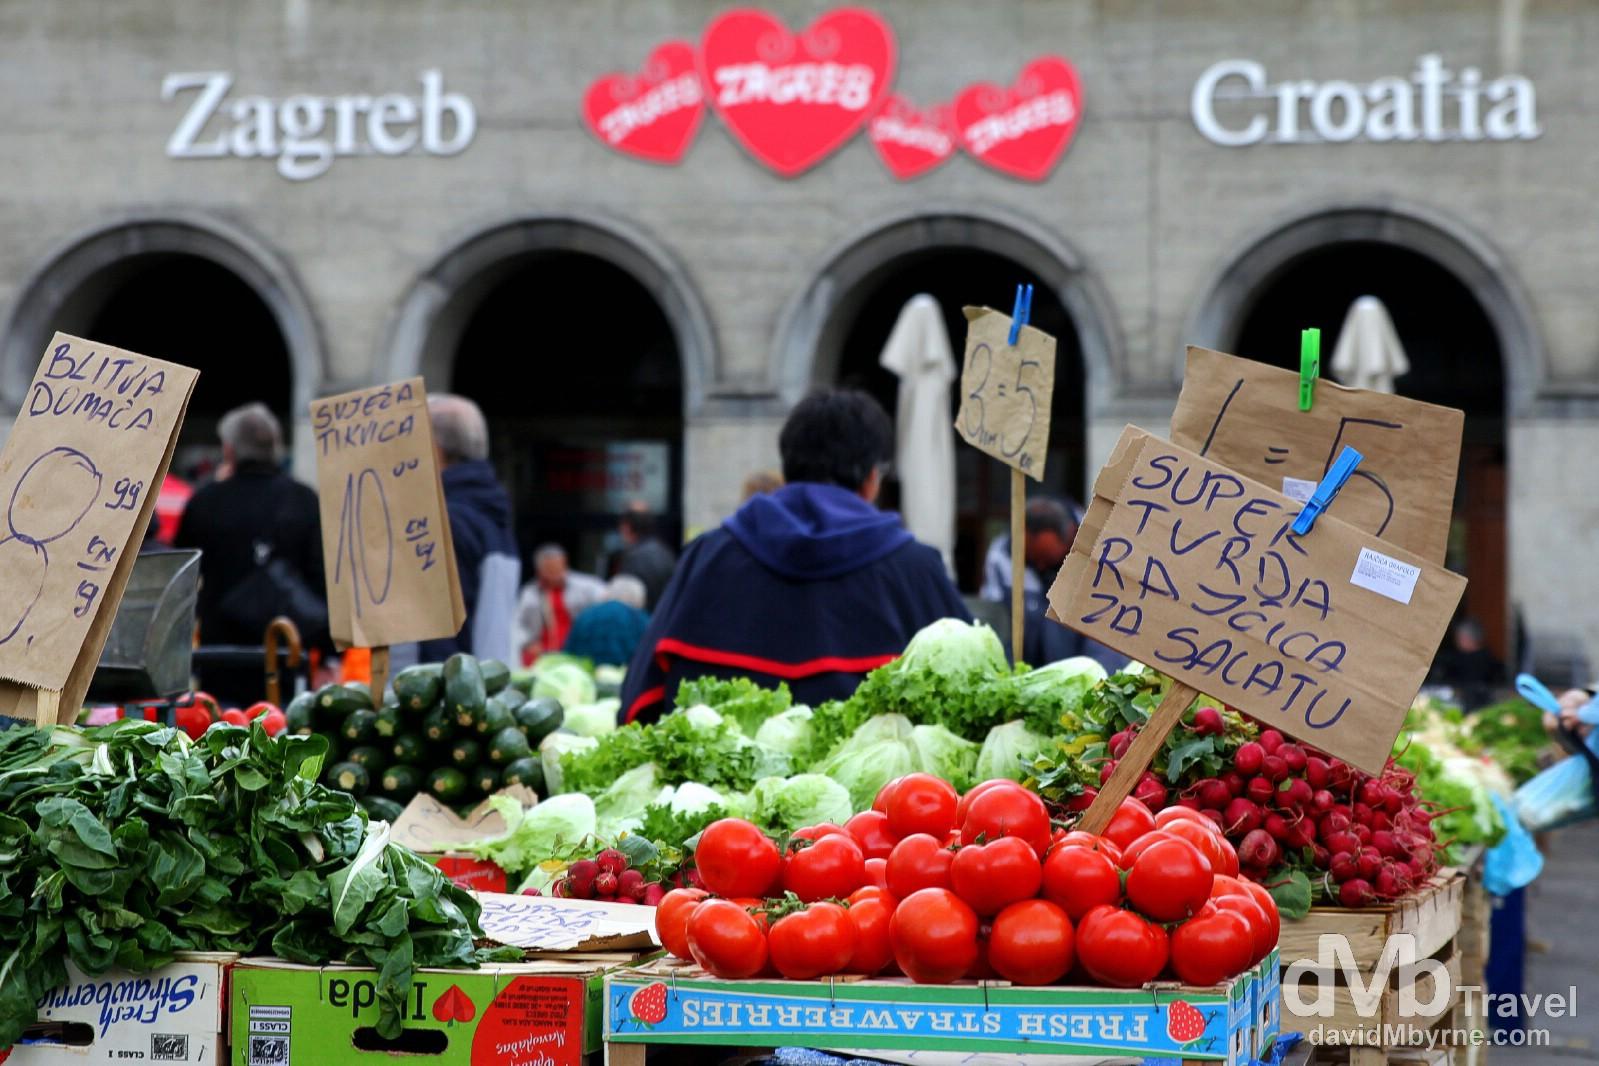 Dolac Fruit & Vegetable Market, Zagreb, Croatia. March 24th, 2014.